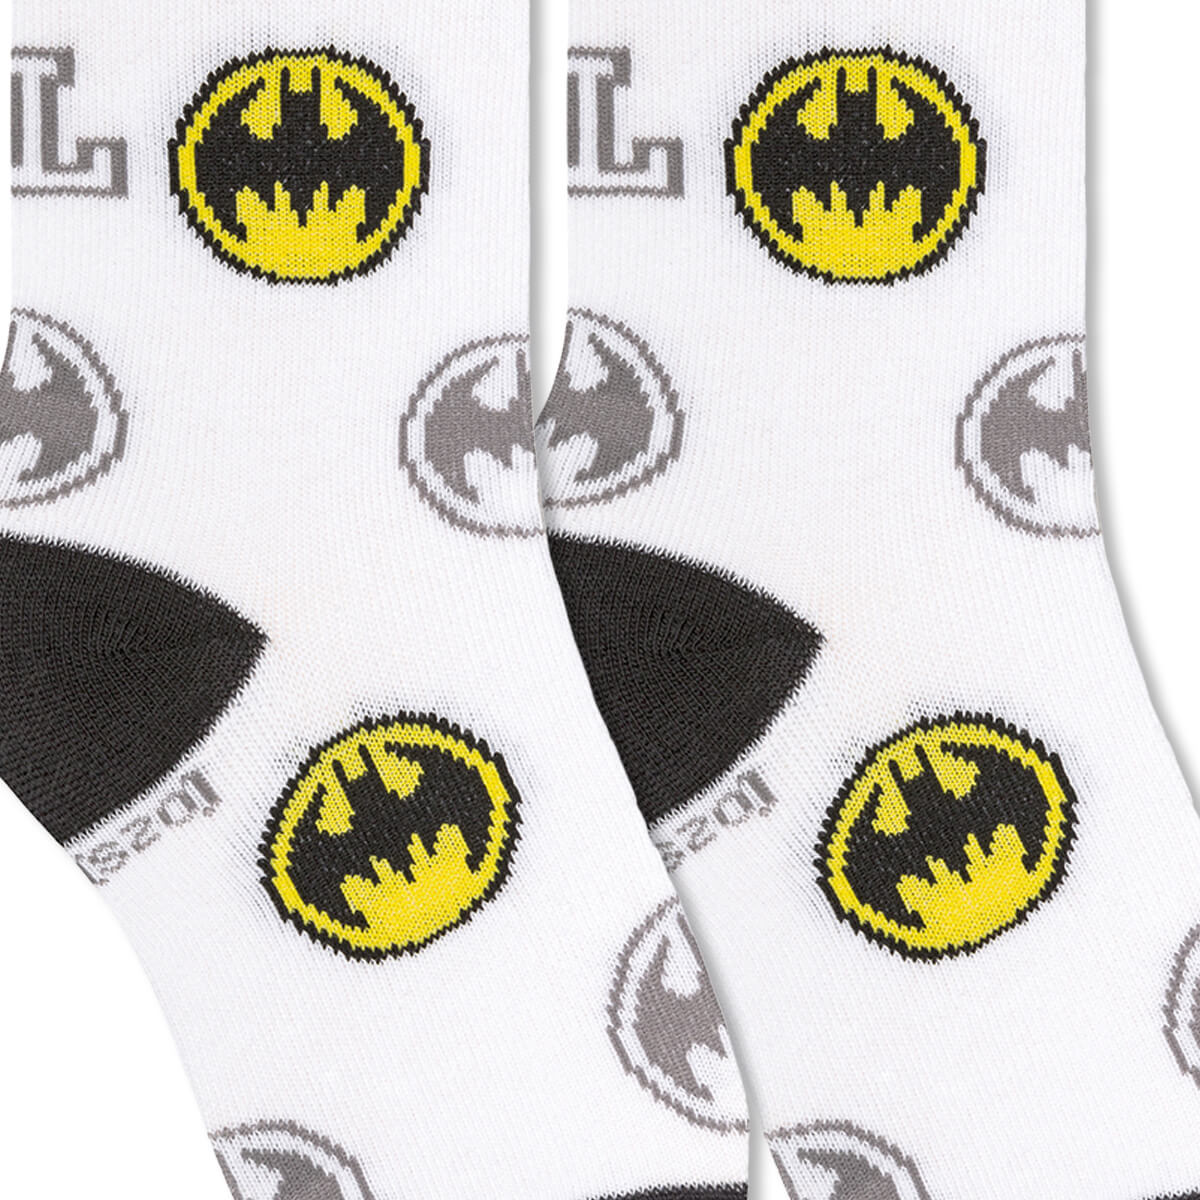 Meia Infantil Menino 29 ao 34 Liga da Justiça Batman Batsinal